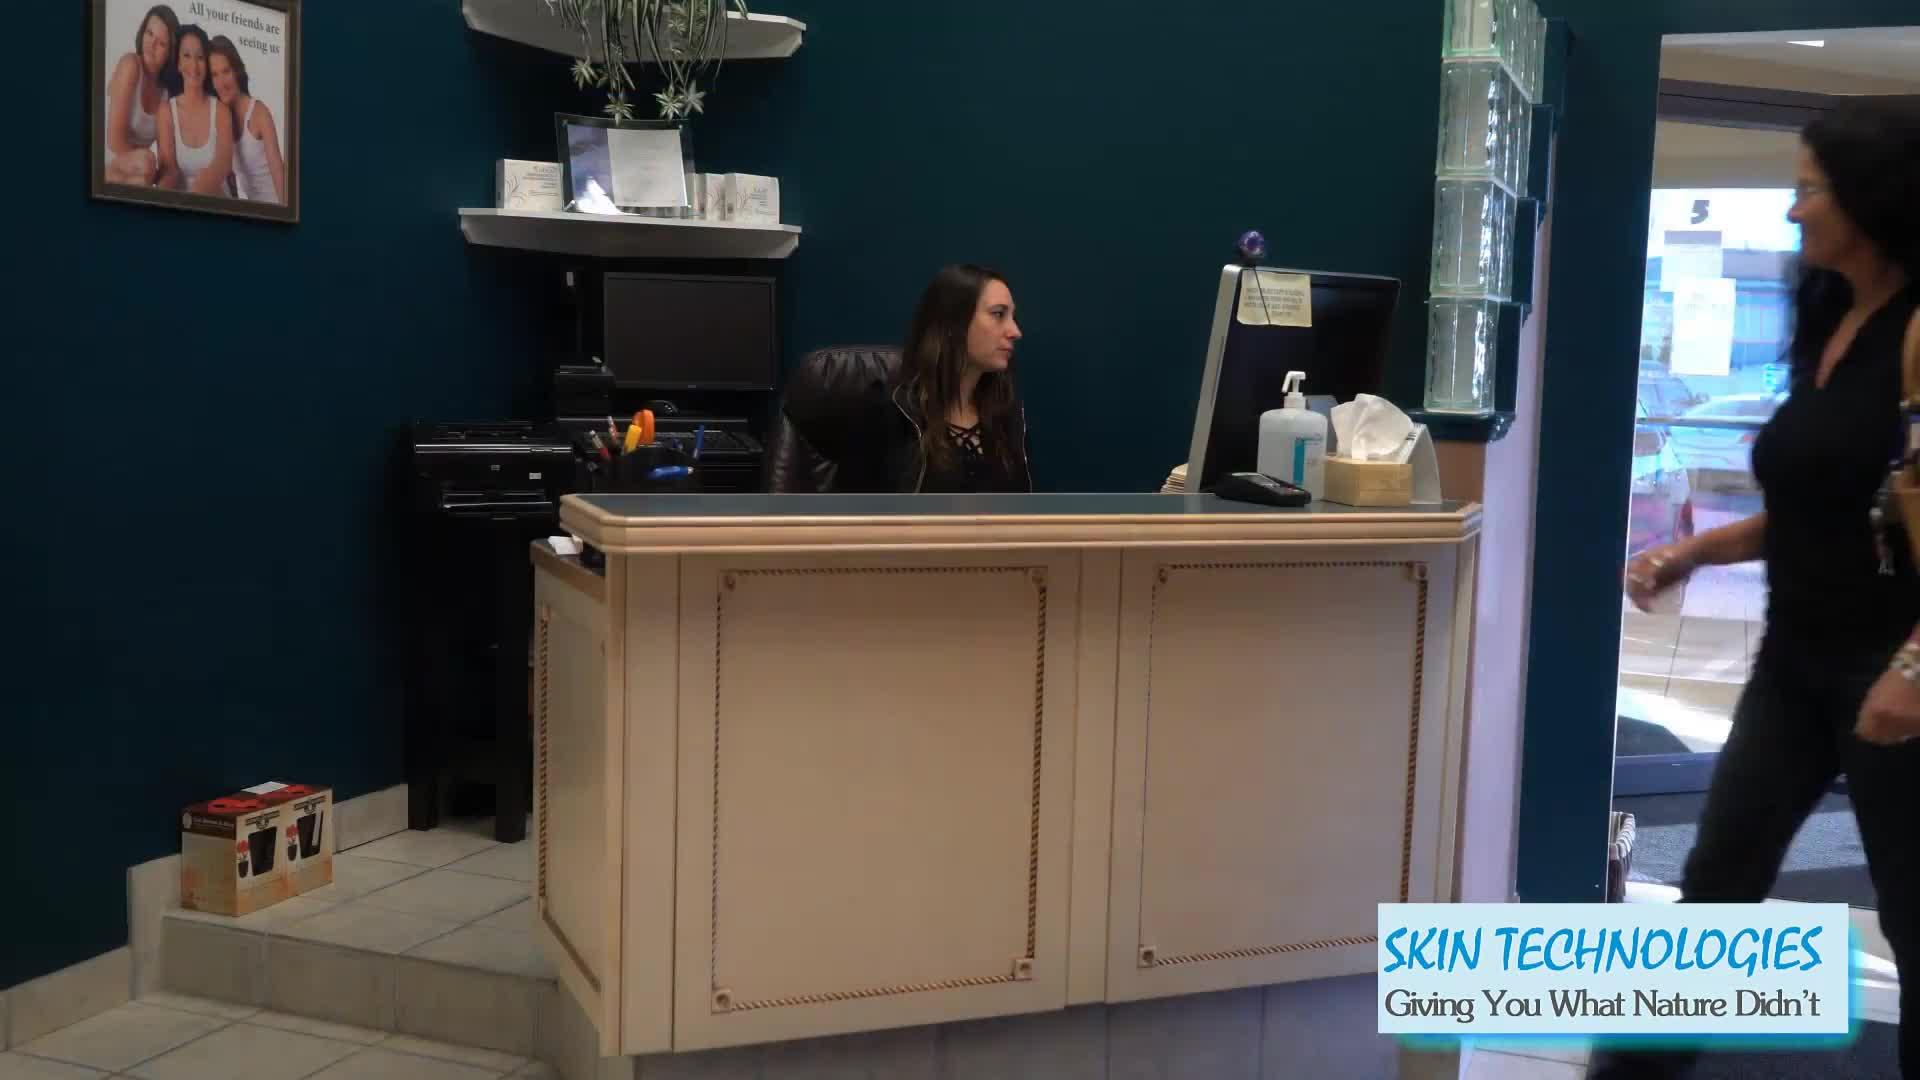 Skintechnologies - Cosmetic & Plastic Surgery - 4035044156